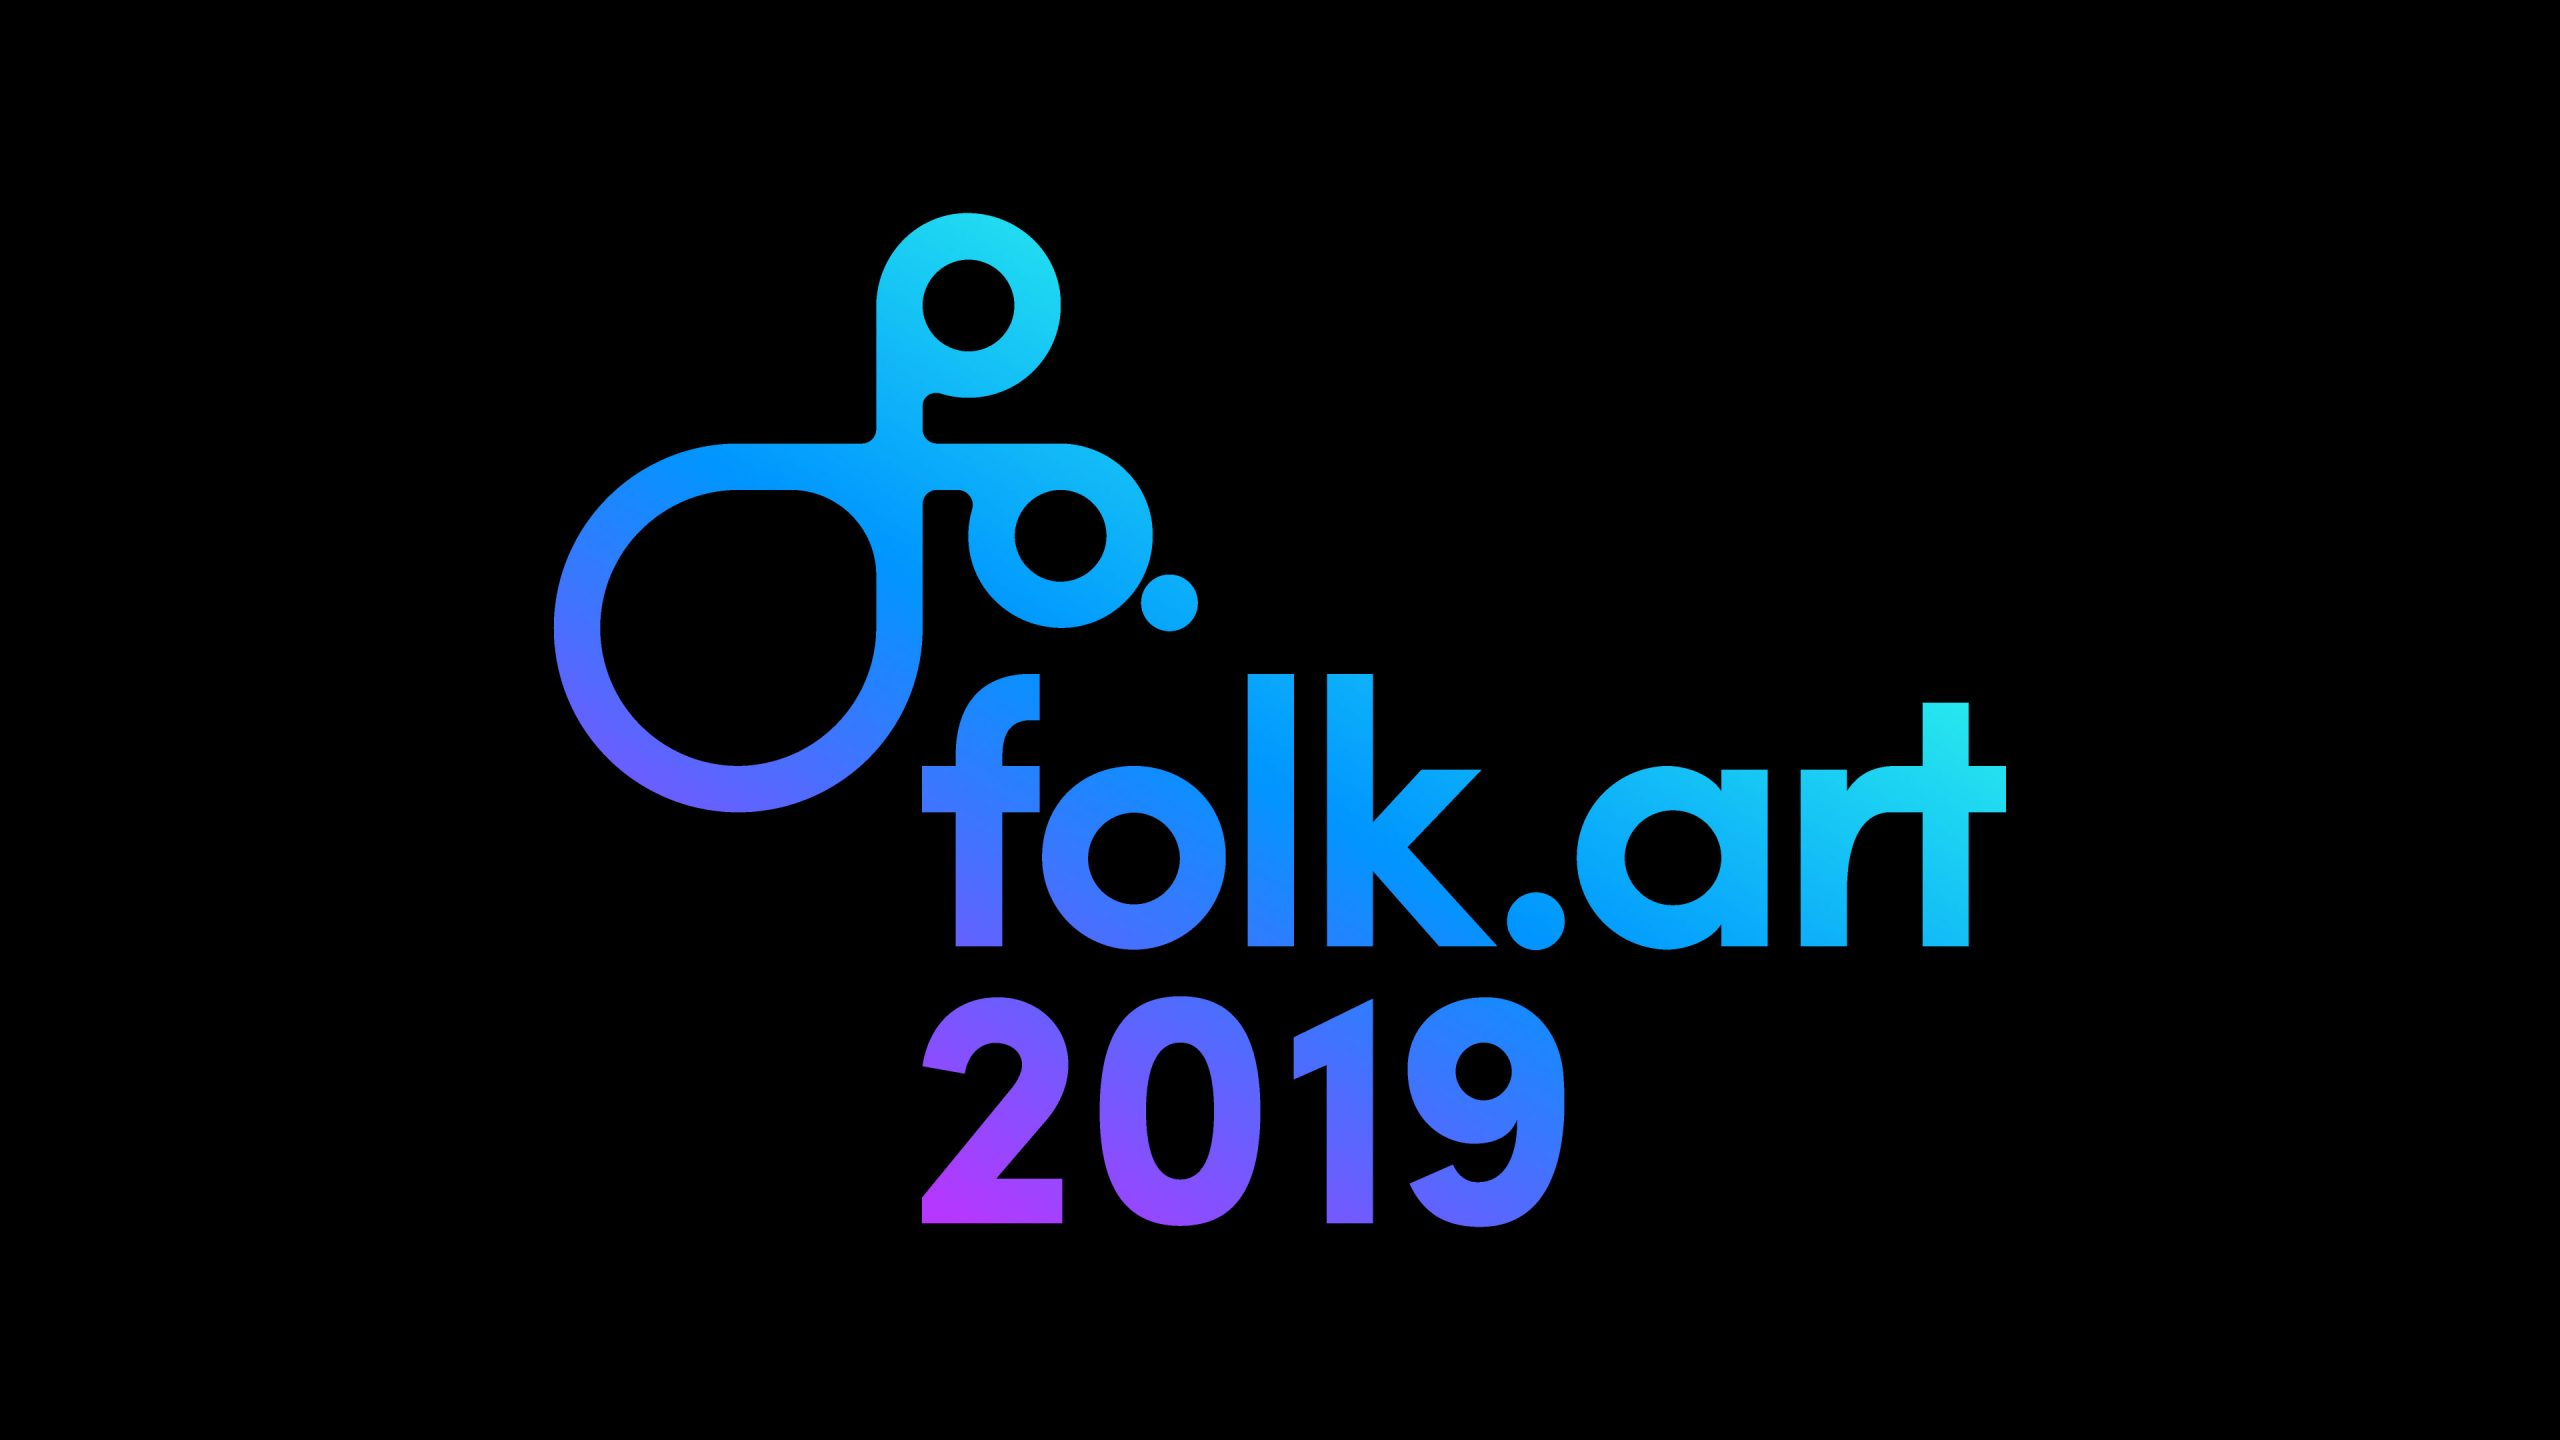 folk.art 2019